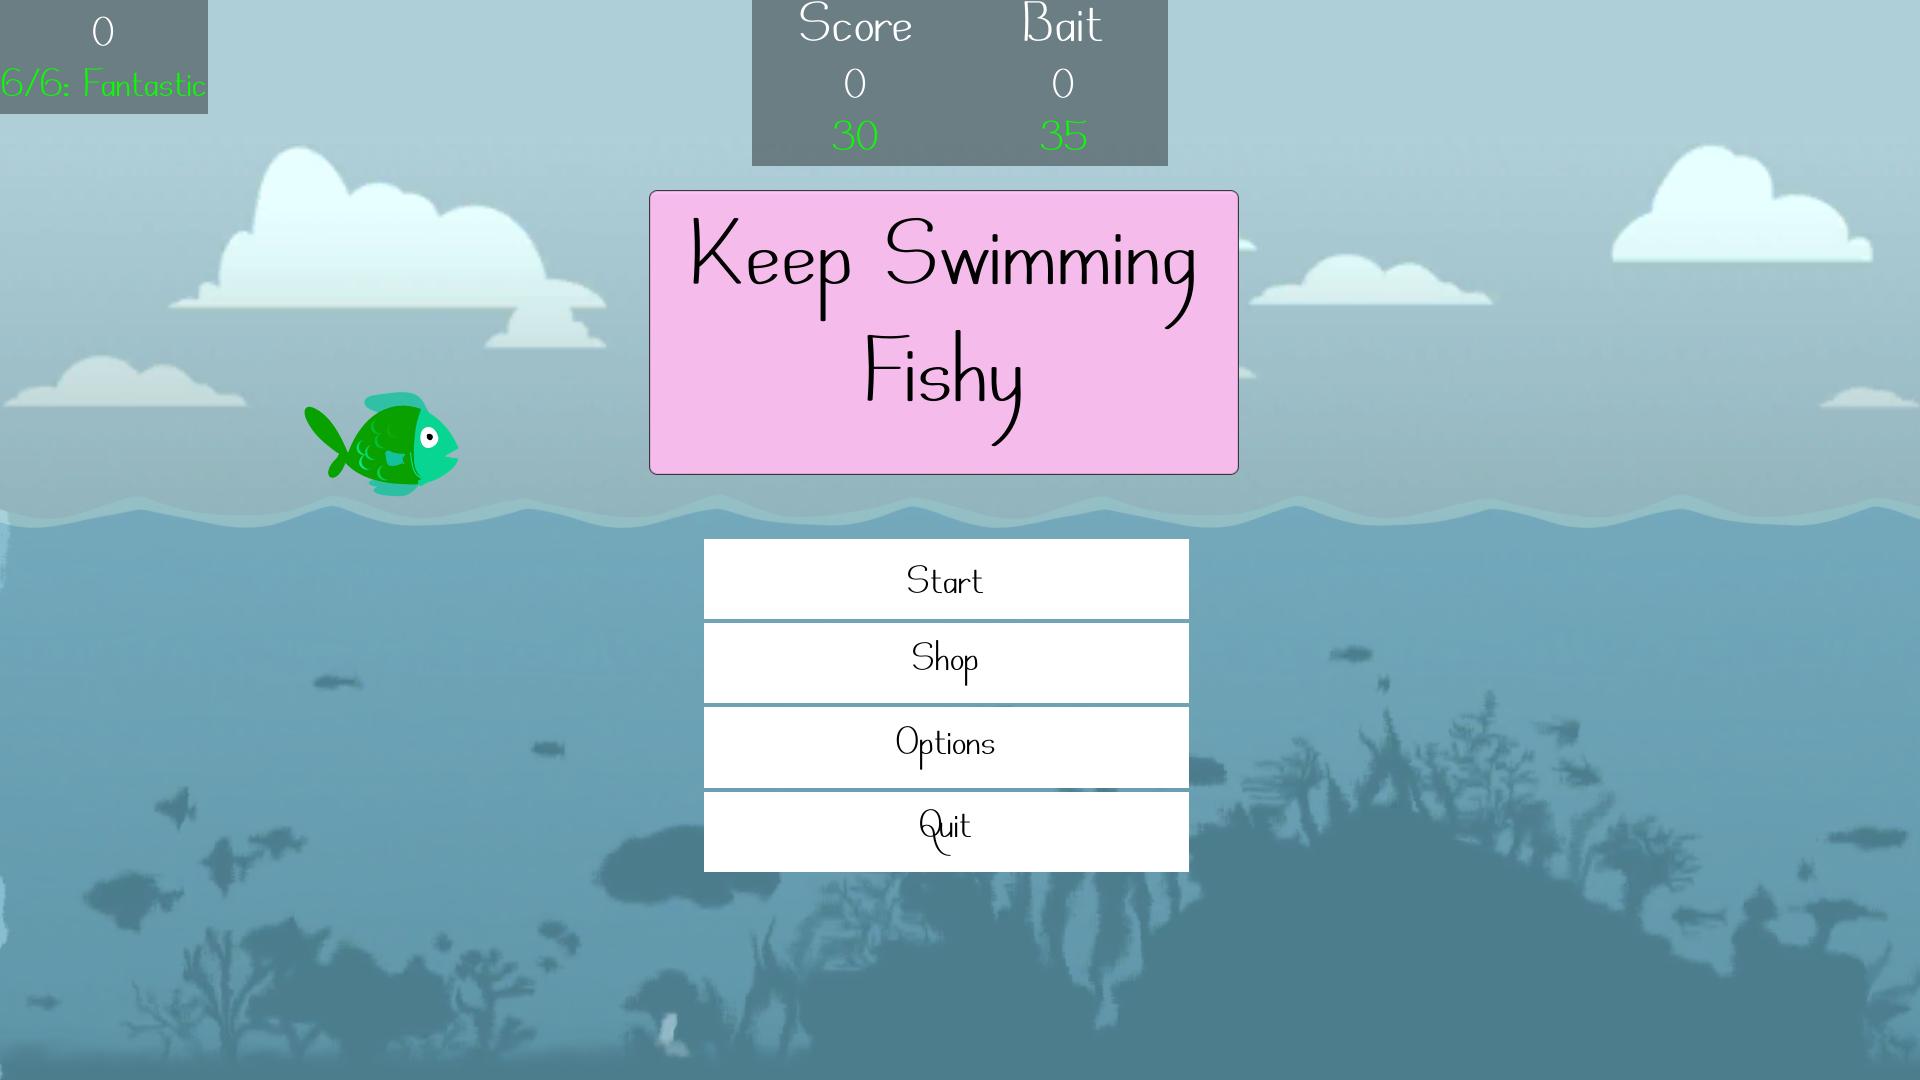 Keep Swimming Fishy